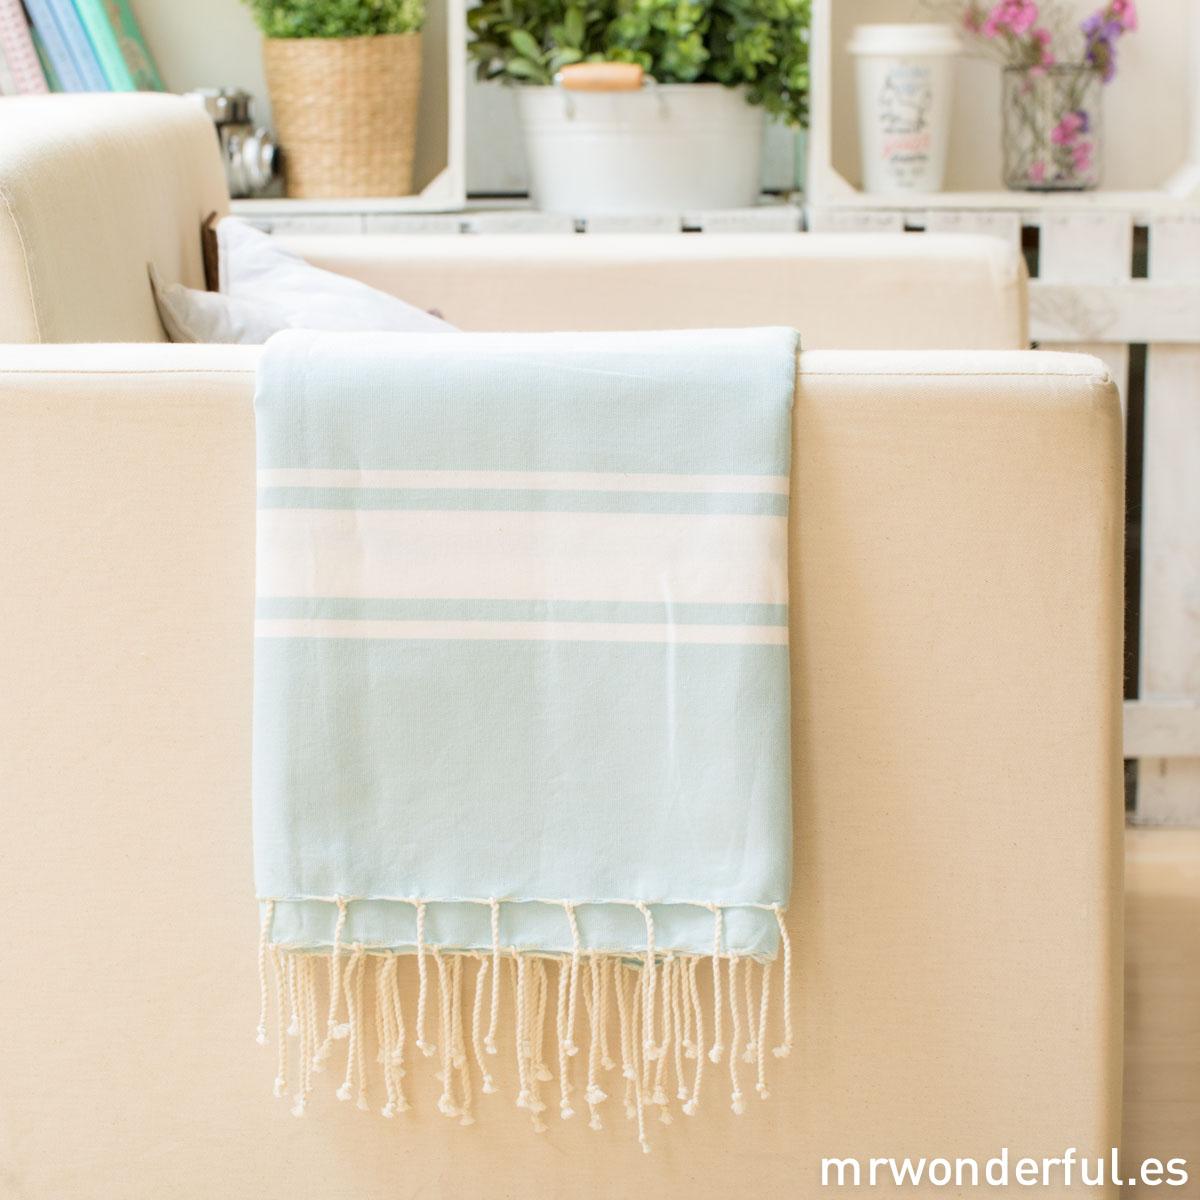 mrwonderful_bleu-pastel_plaid-azul-pastel-13